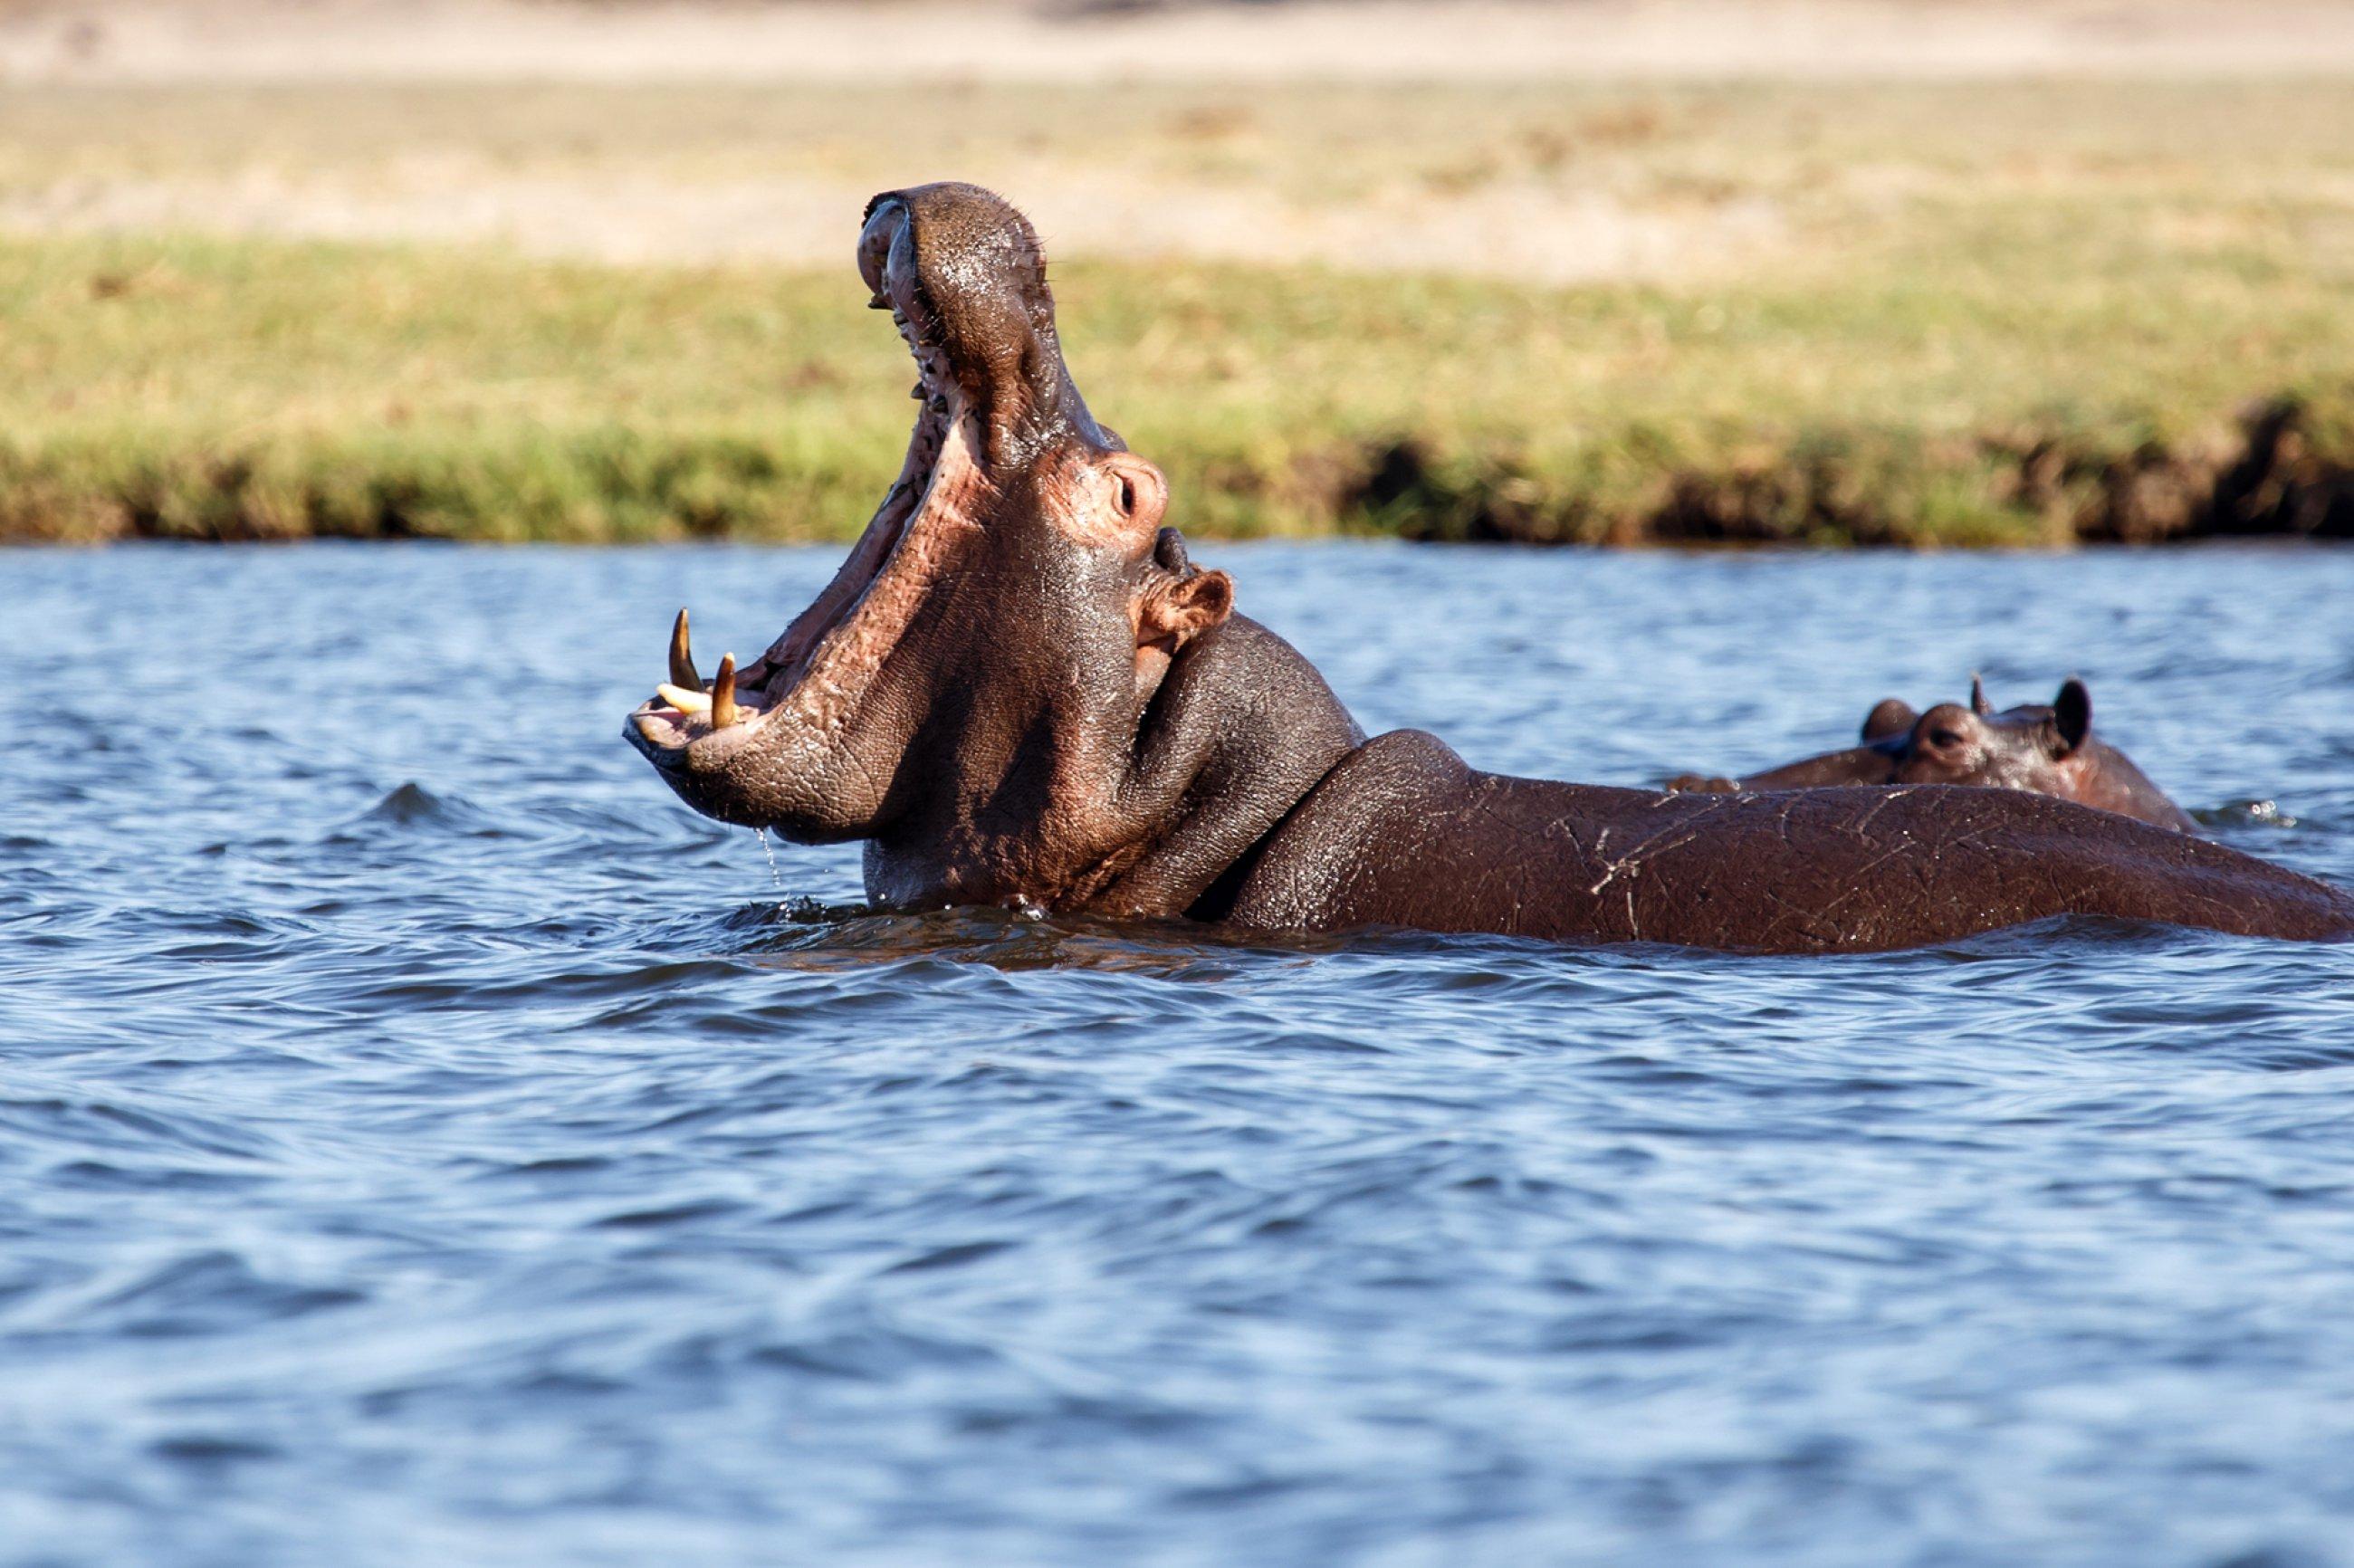 https://bubo.sk/uploads/galleries/7335/120-121-zoci-voci-najnebezpecnejsiemu-zvieratu-afriky..jpg